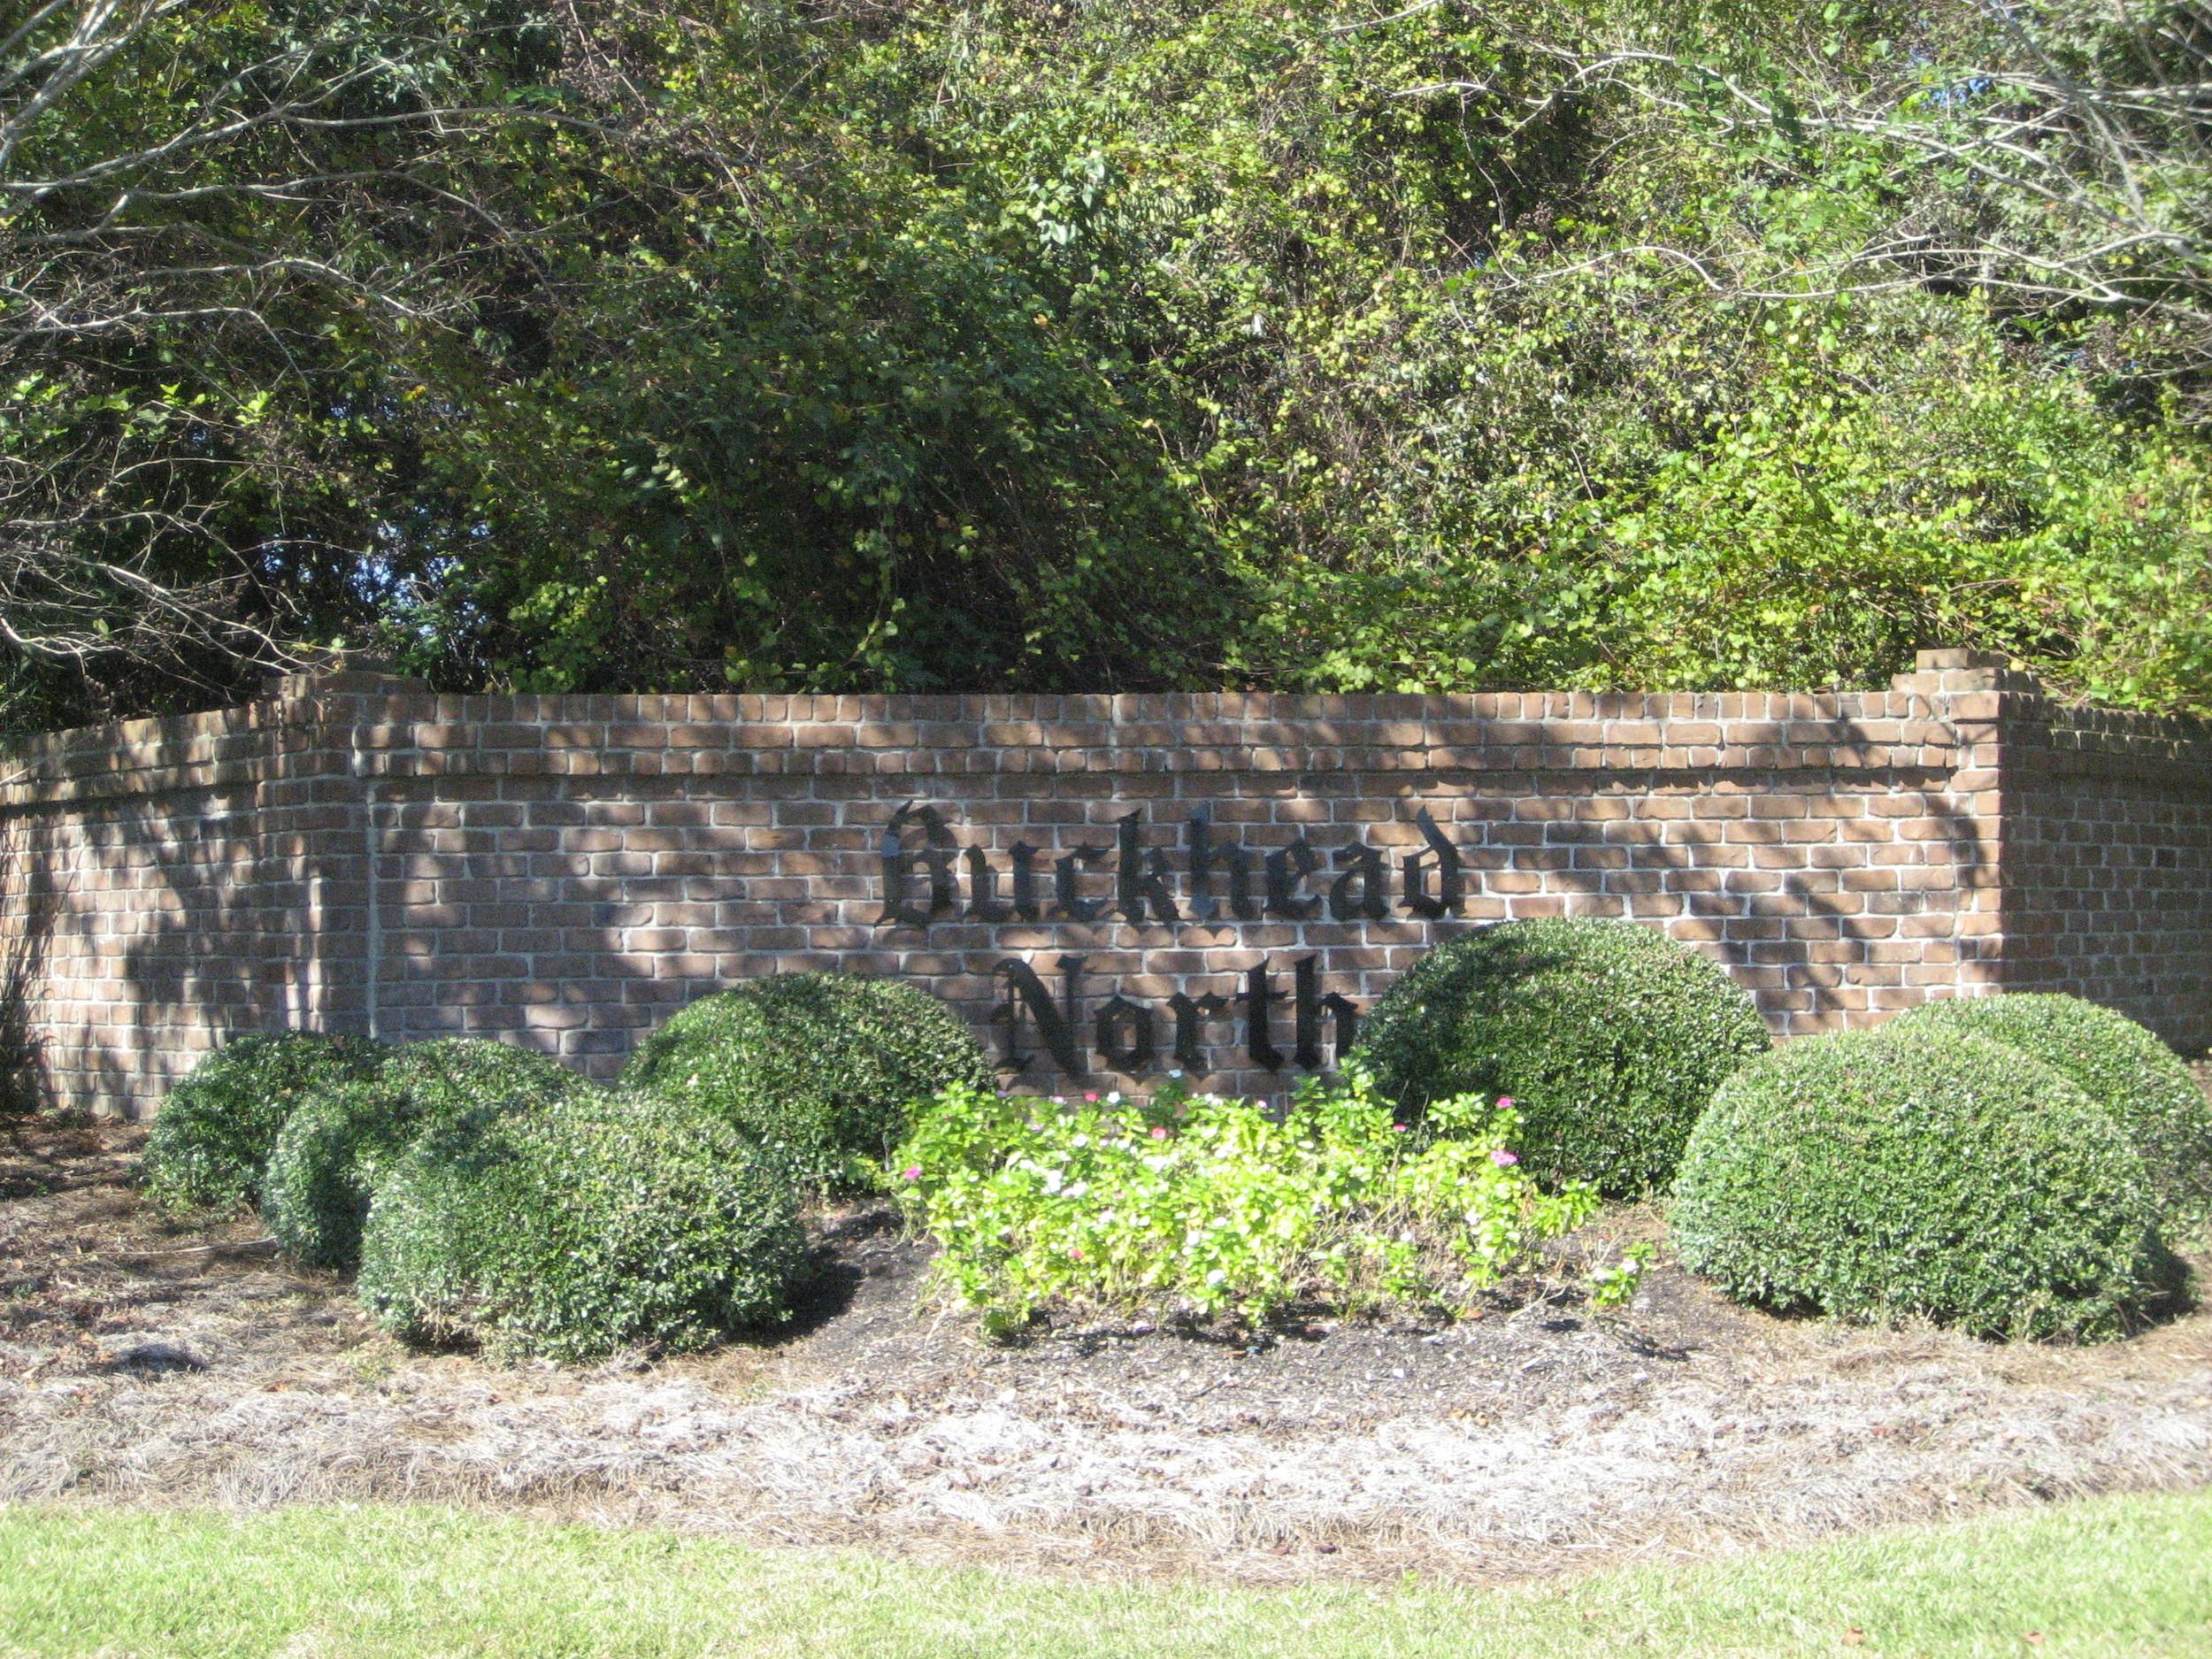 Buckhead Back Entrance Sign.JPG